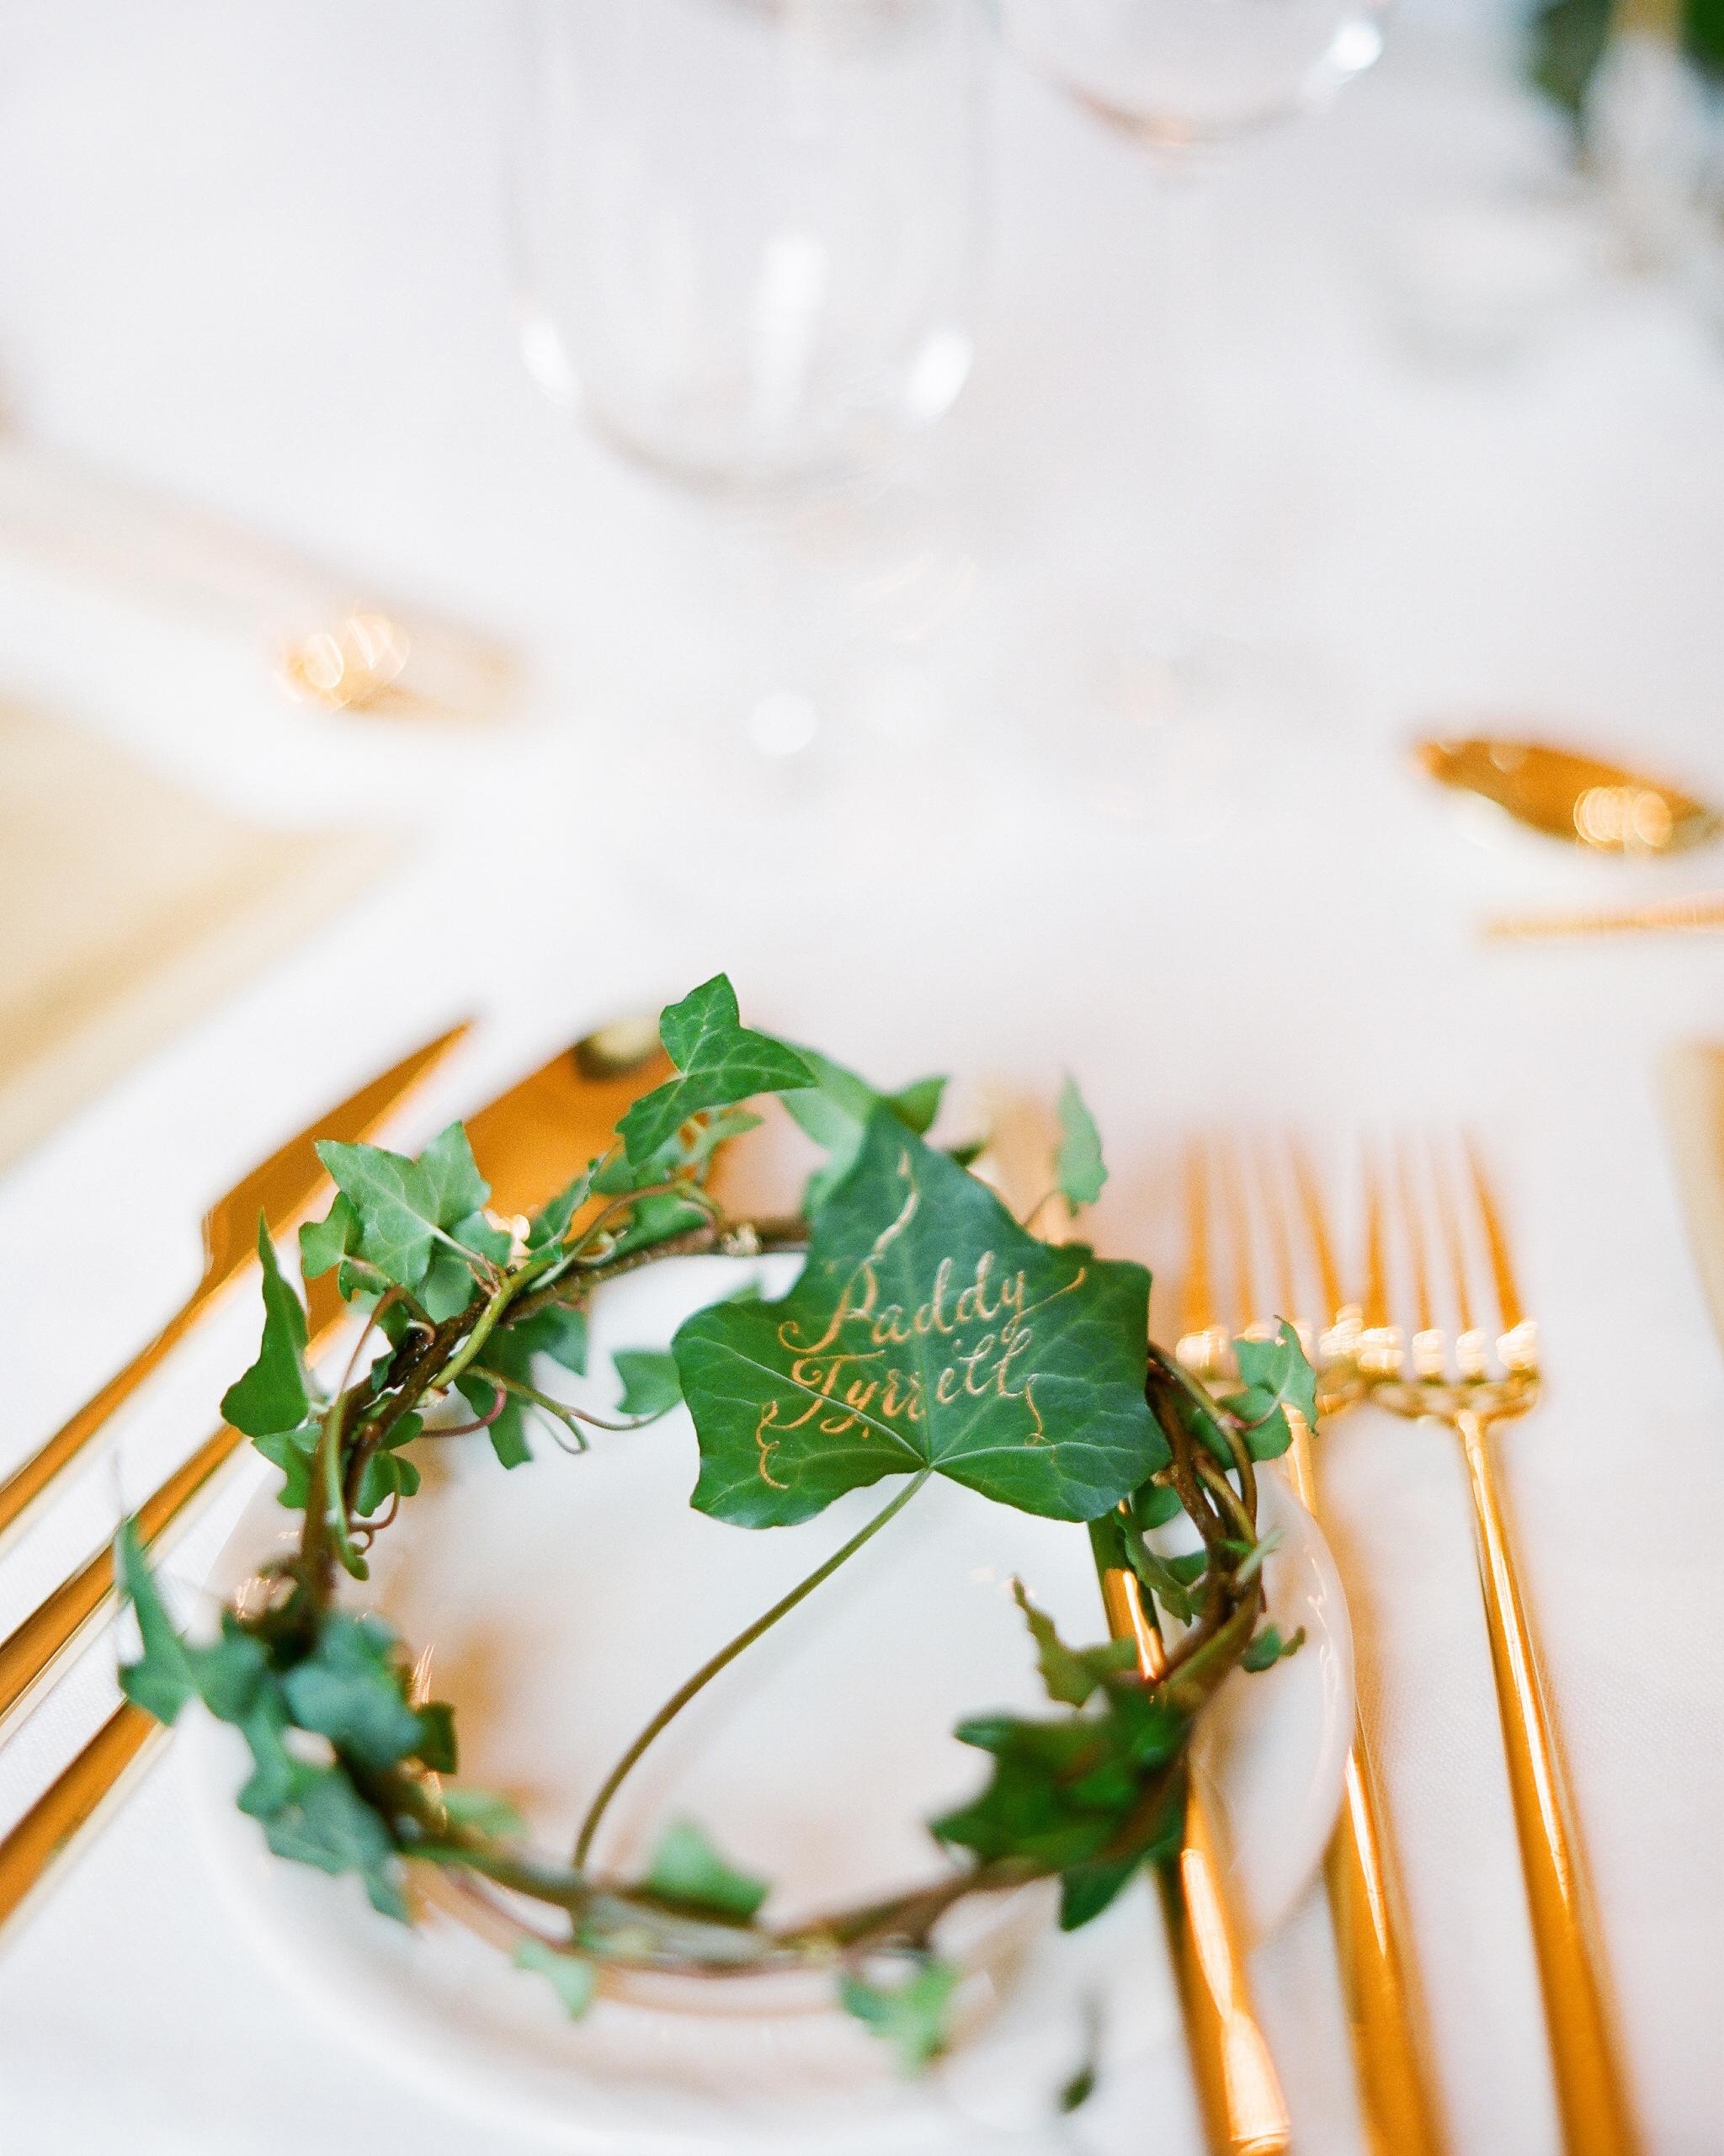 jo-andrew-wedding-ireland-0686-s112147.jpg